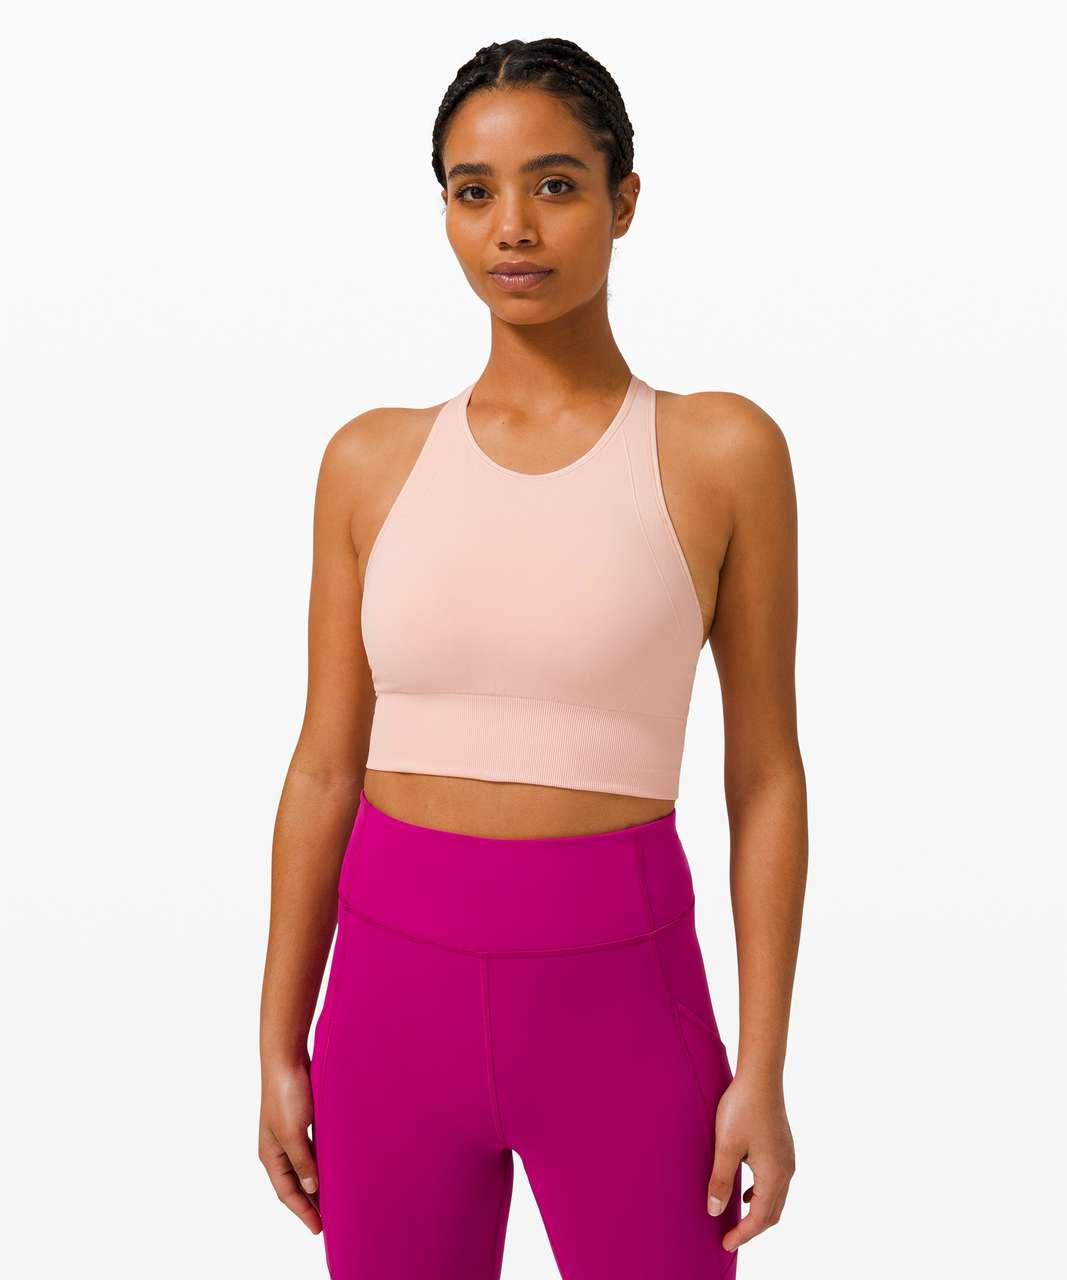 Lululemon Ebb to Train Bra *Medium Support, C/D Cup - Pink Mist